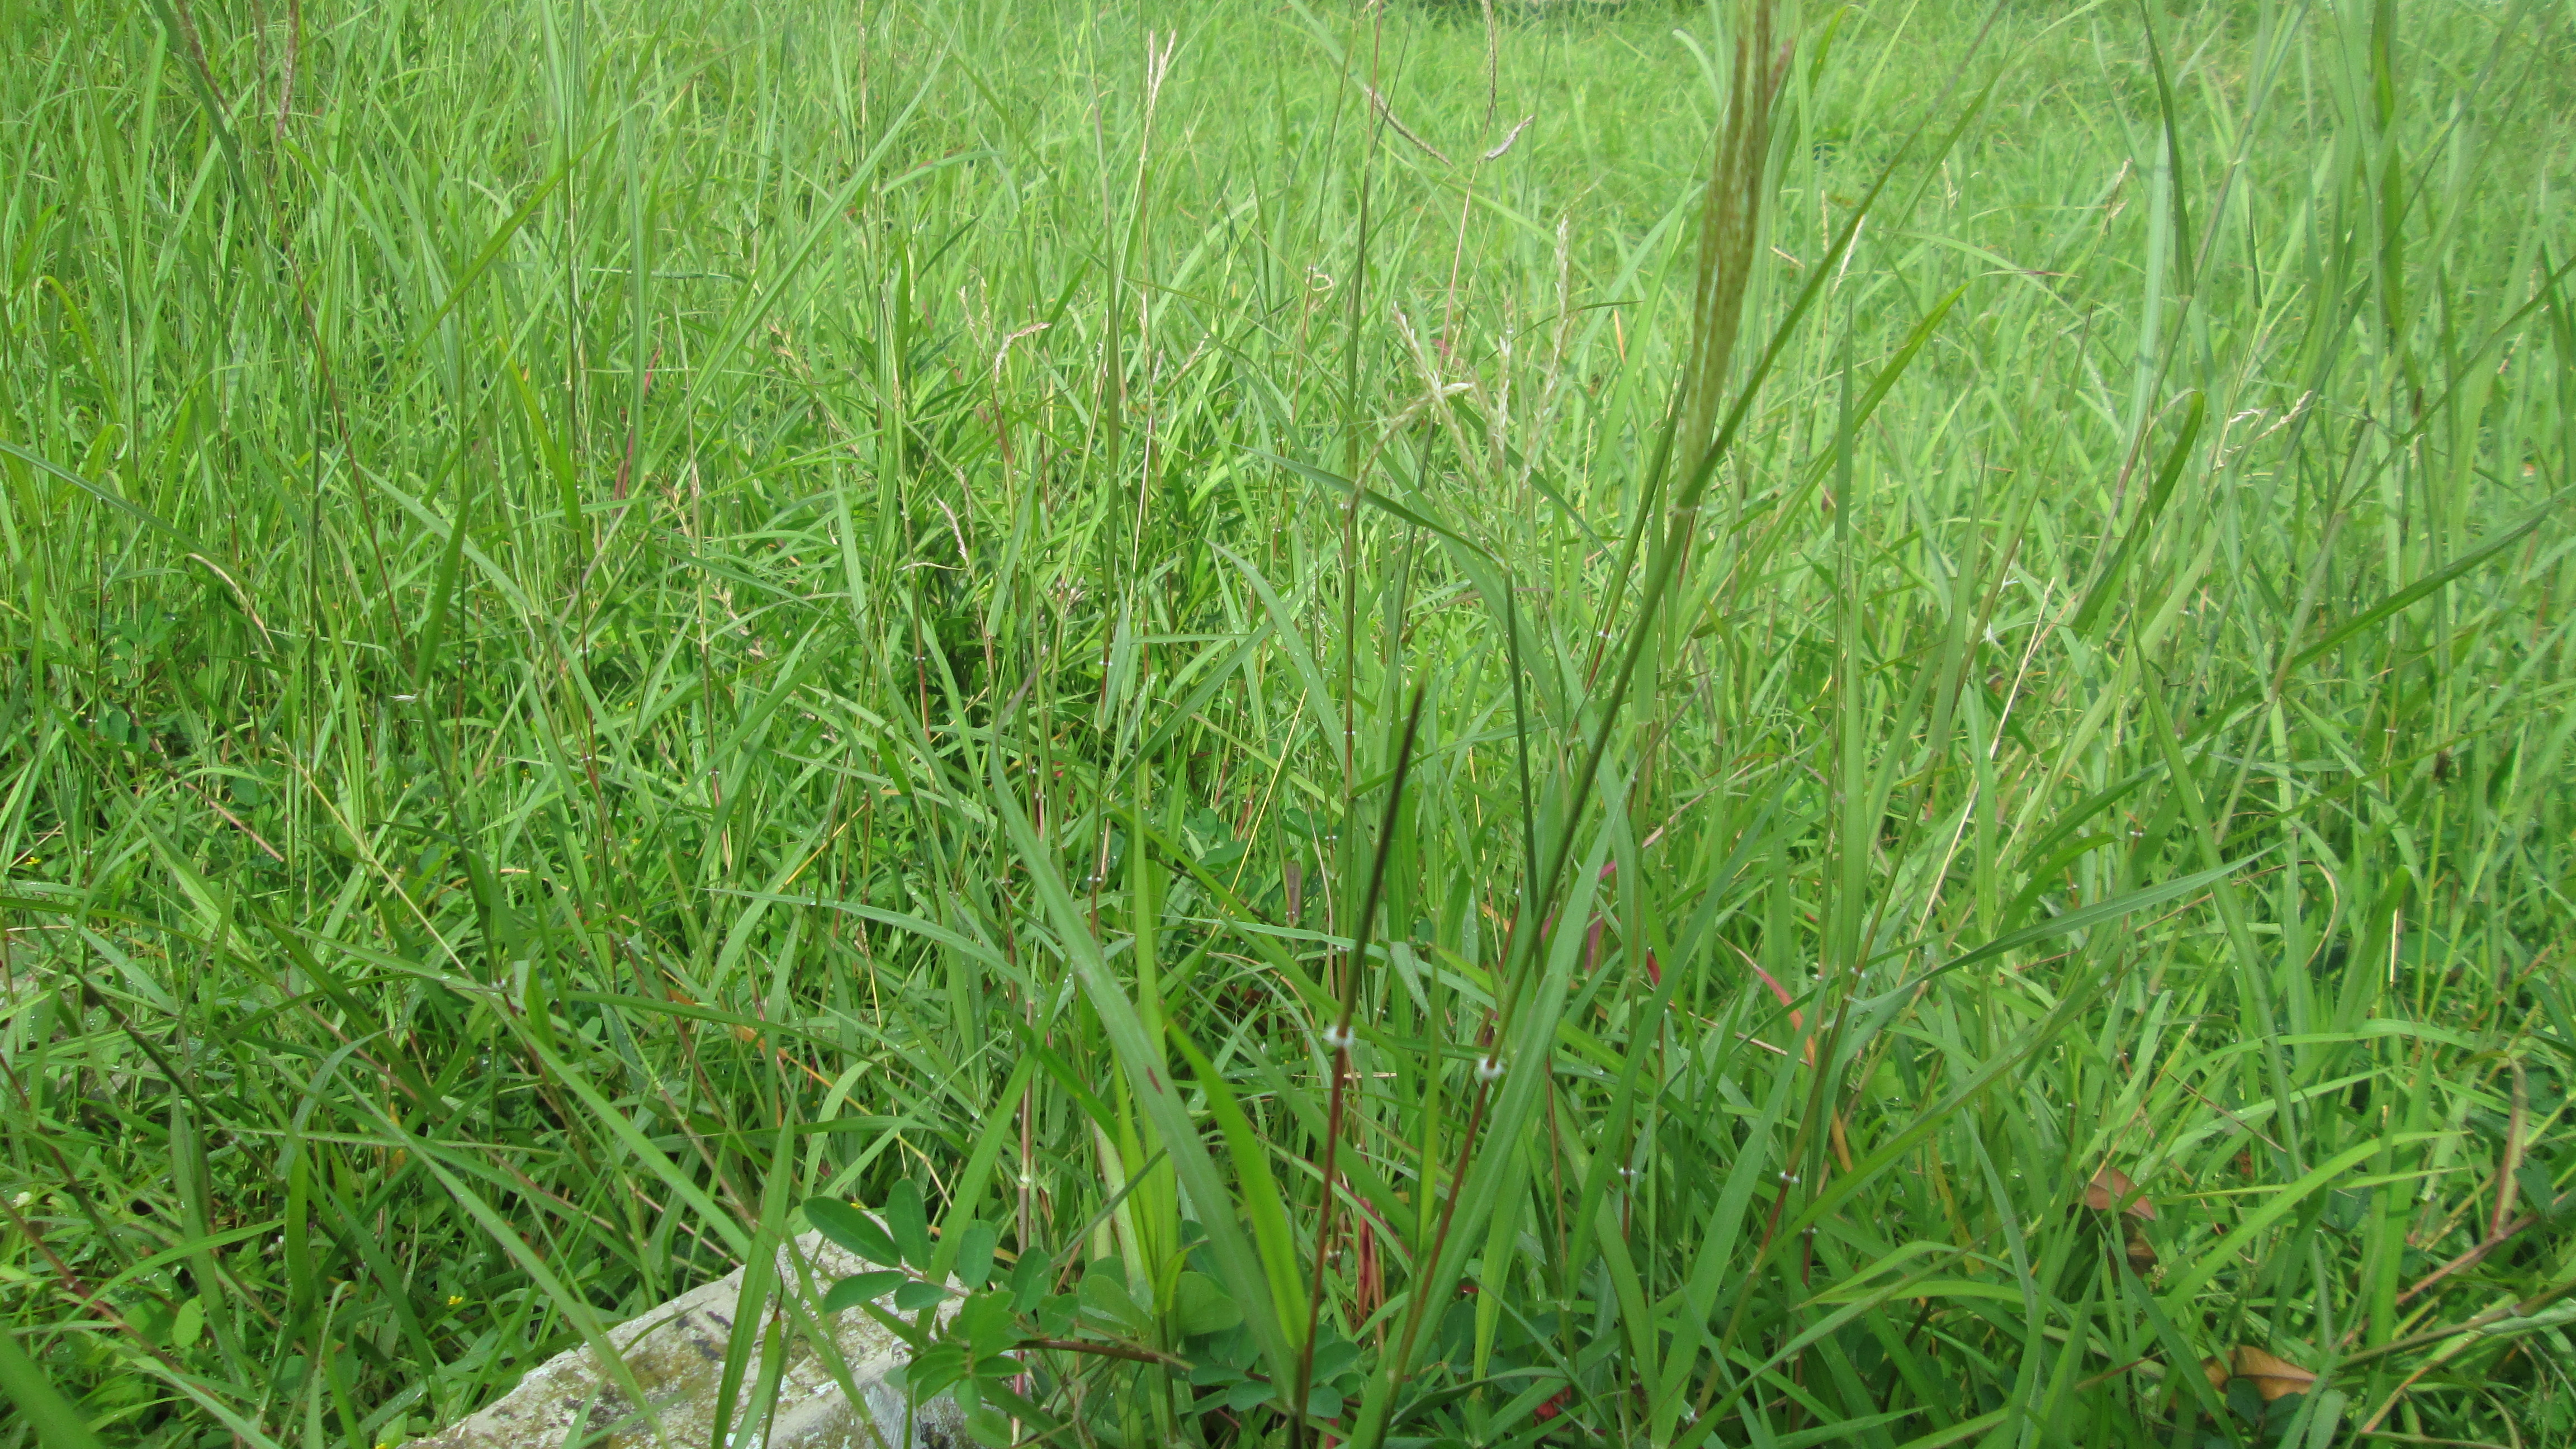 Kandungan Kimia Yang Dimiliki Rumput Teki